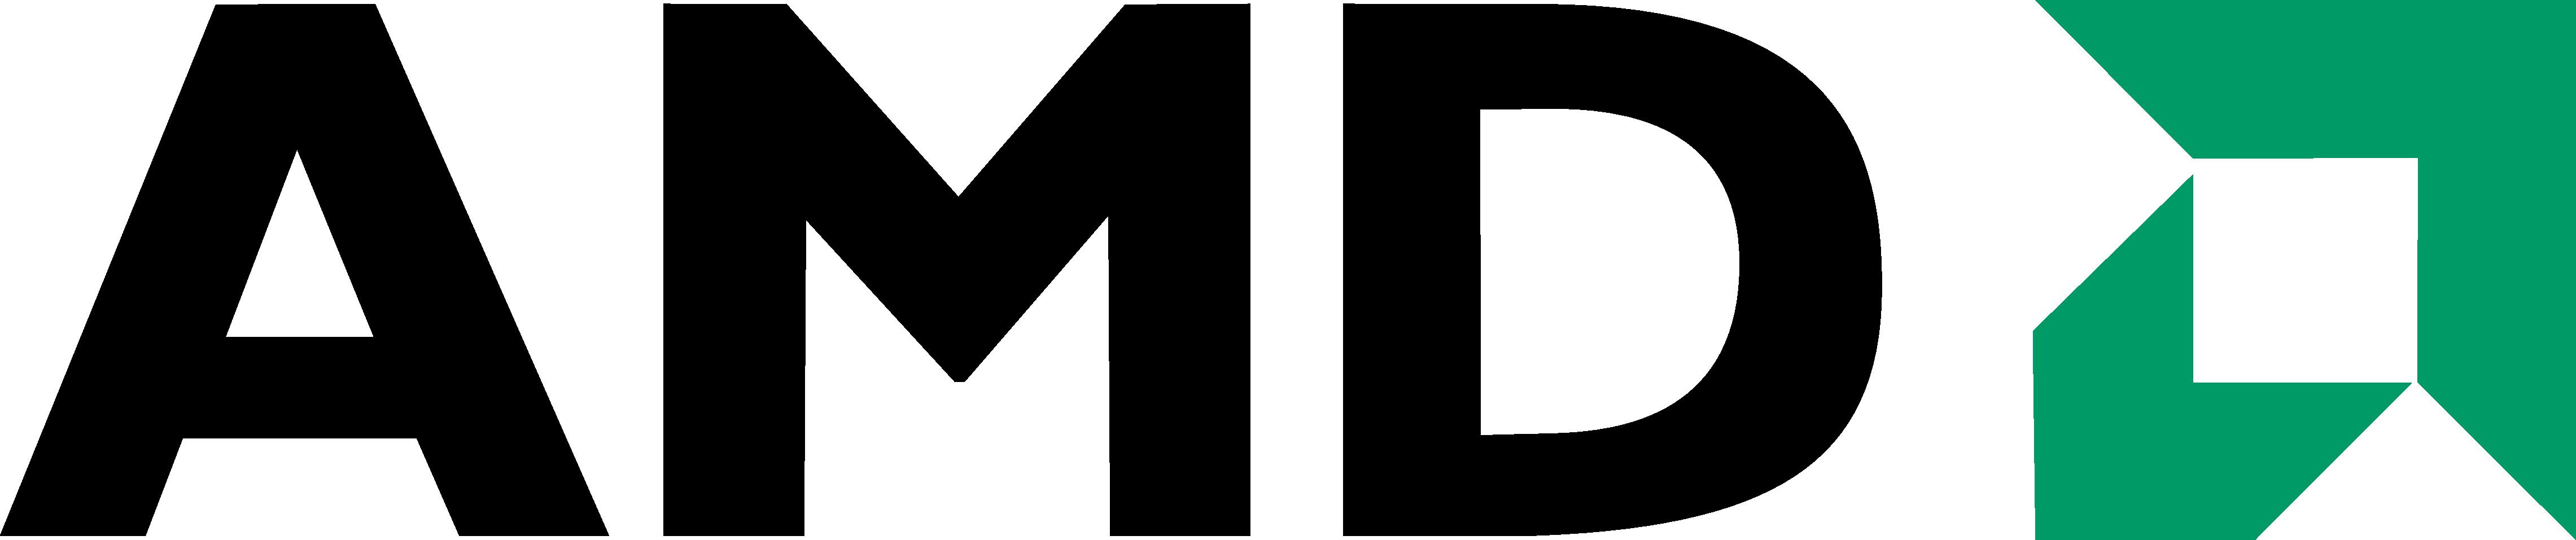 amd logo 2 - AMD Logo